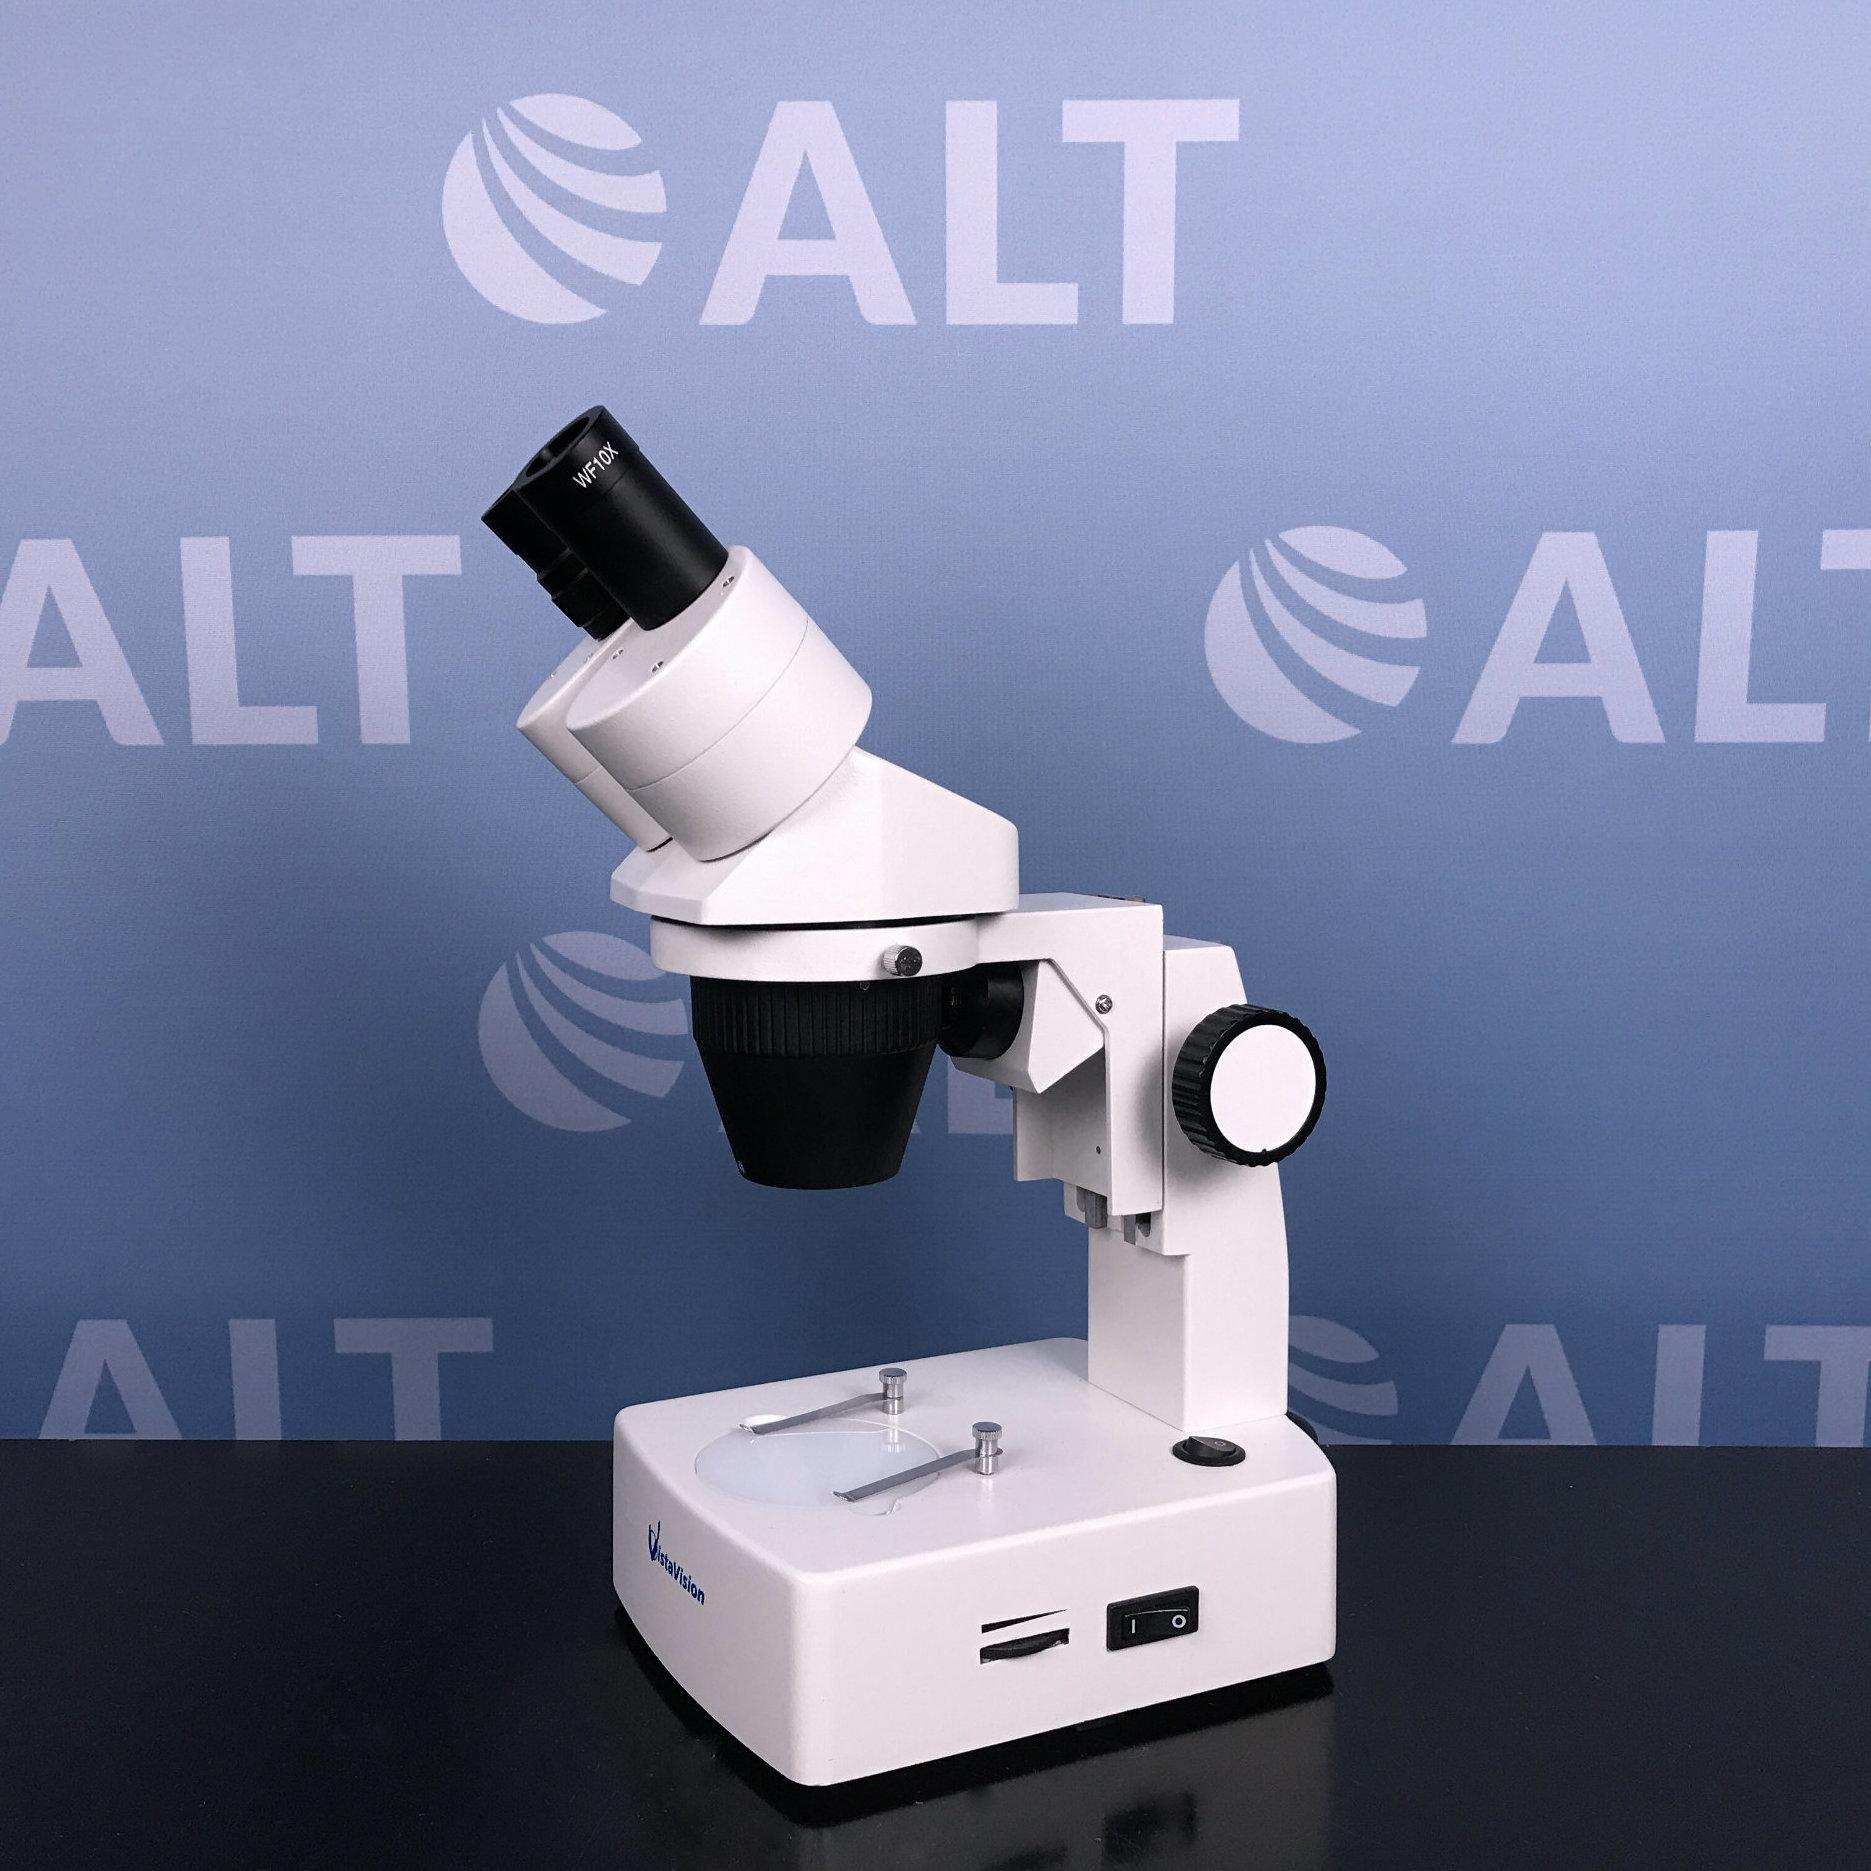 VWR VistaVision Stereo Basic Halogen - Fluorescent 2X - 4X Microscope Image